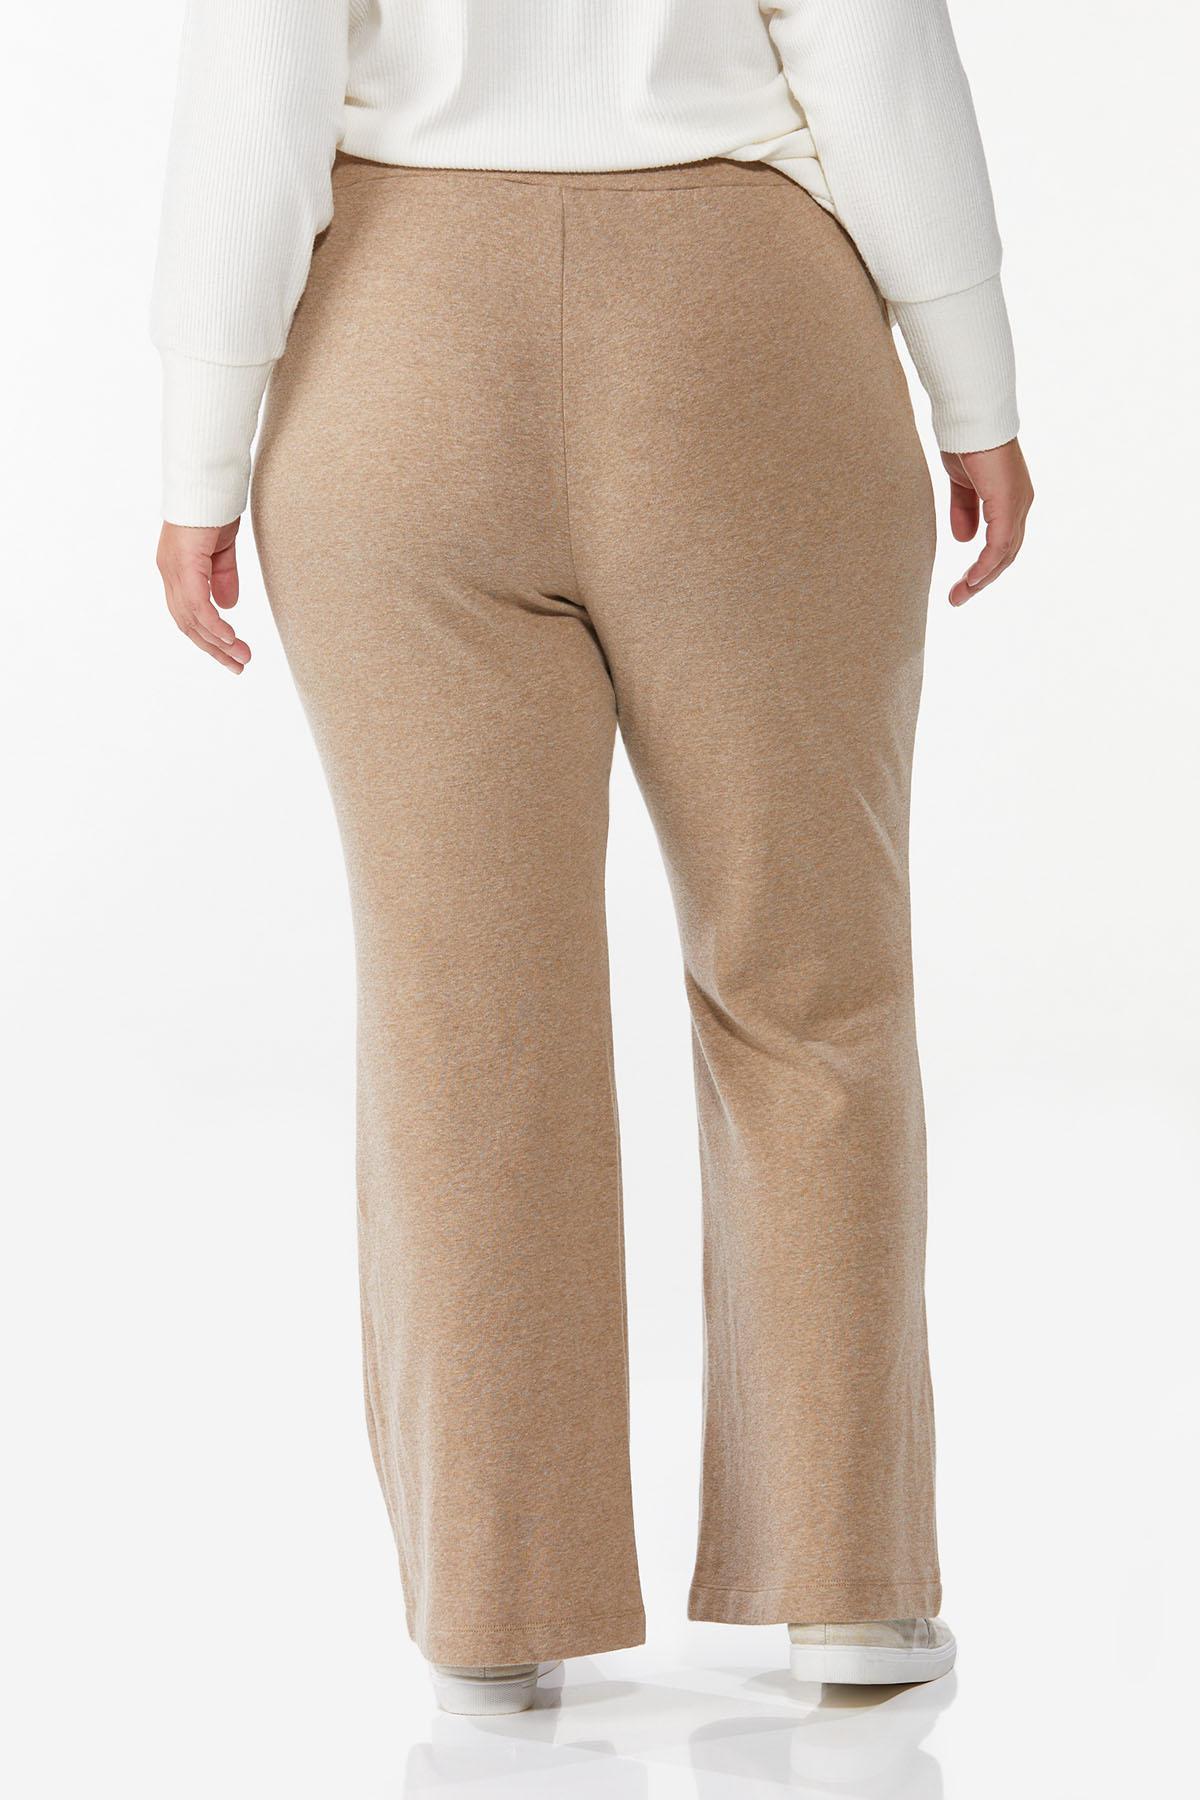 Plus Petite Tan Fleece Pants (Item #44773556)